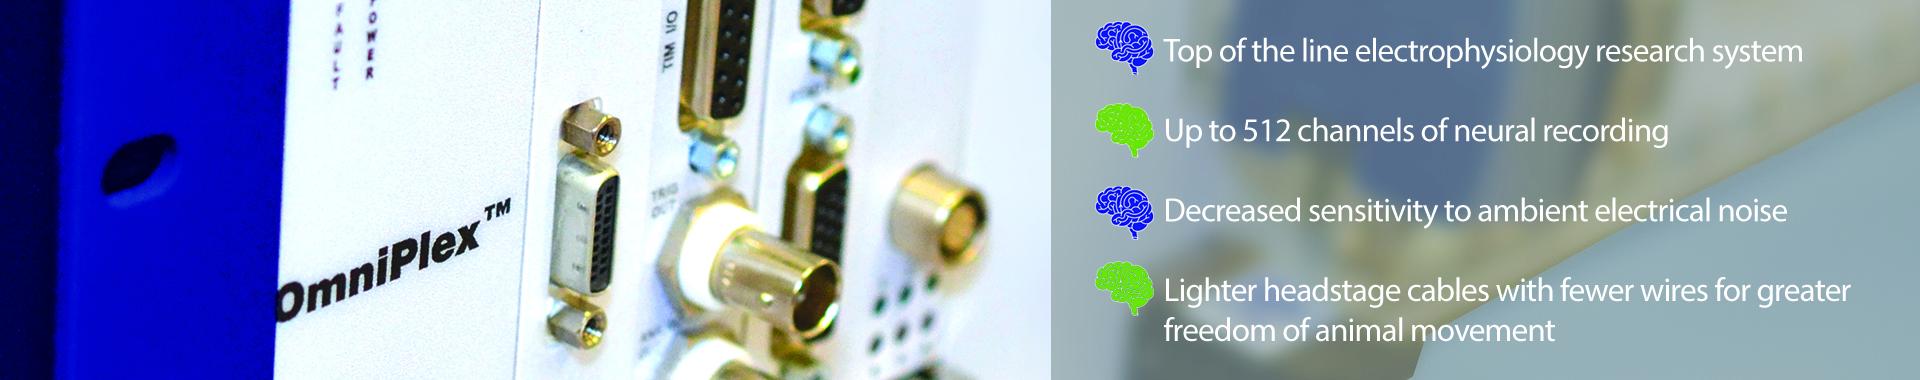 neural-data-acquisition-omniplex